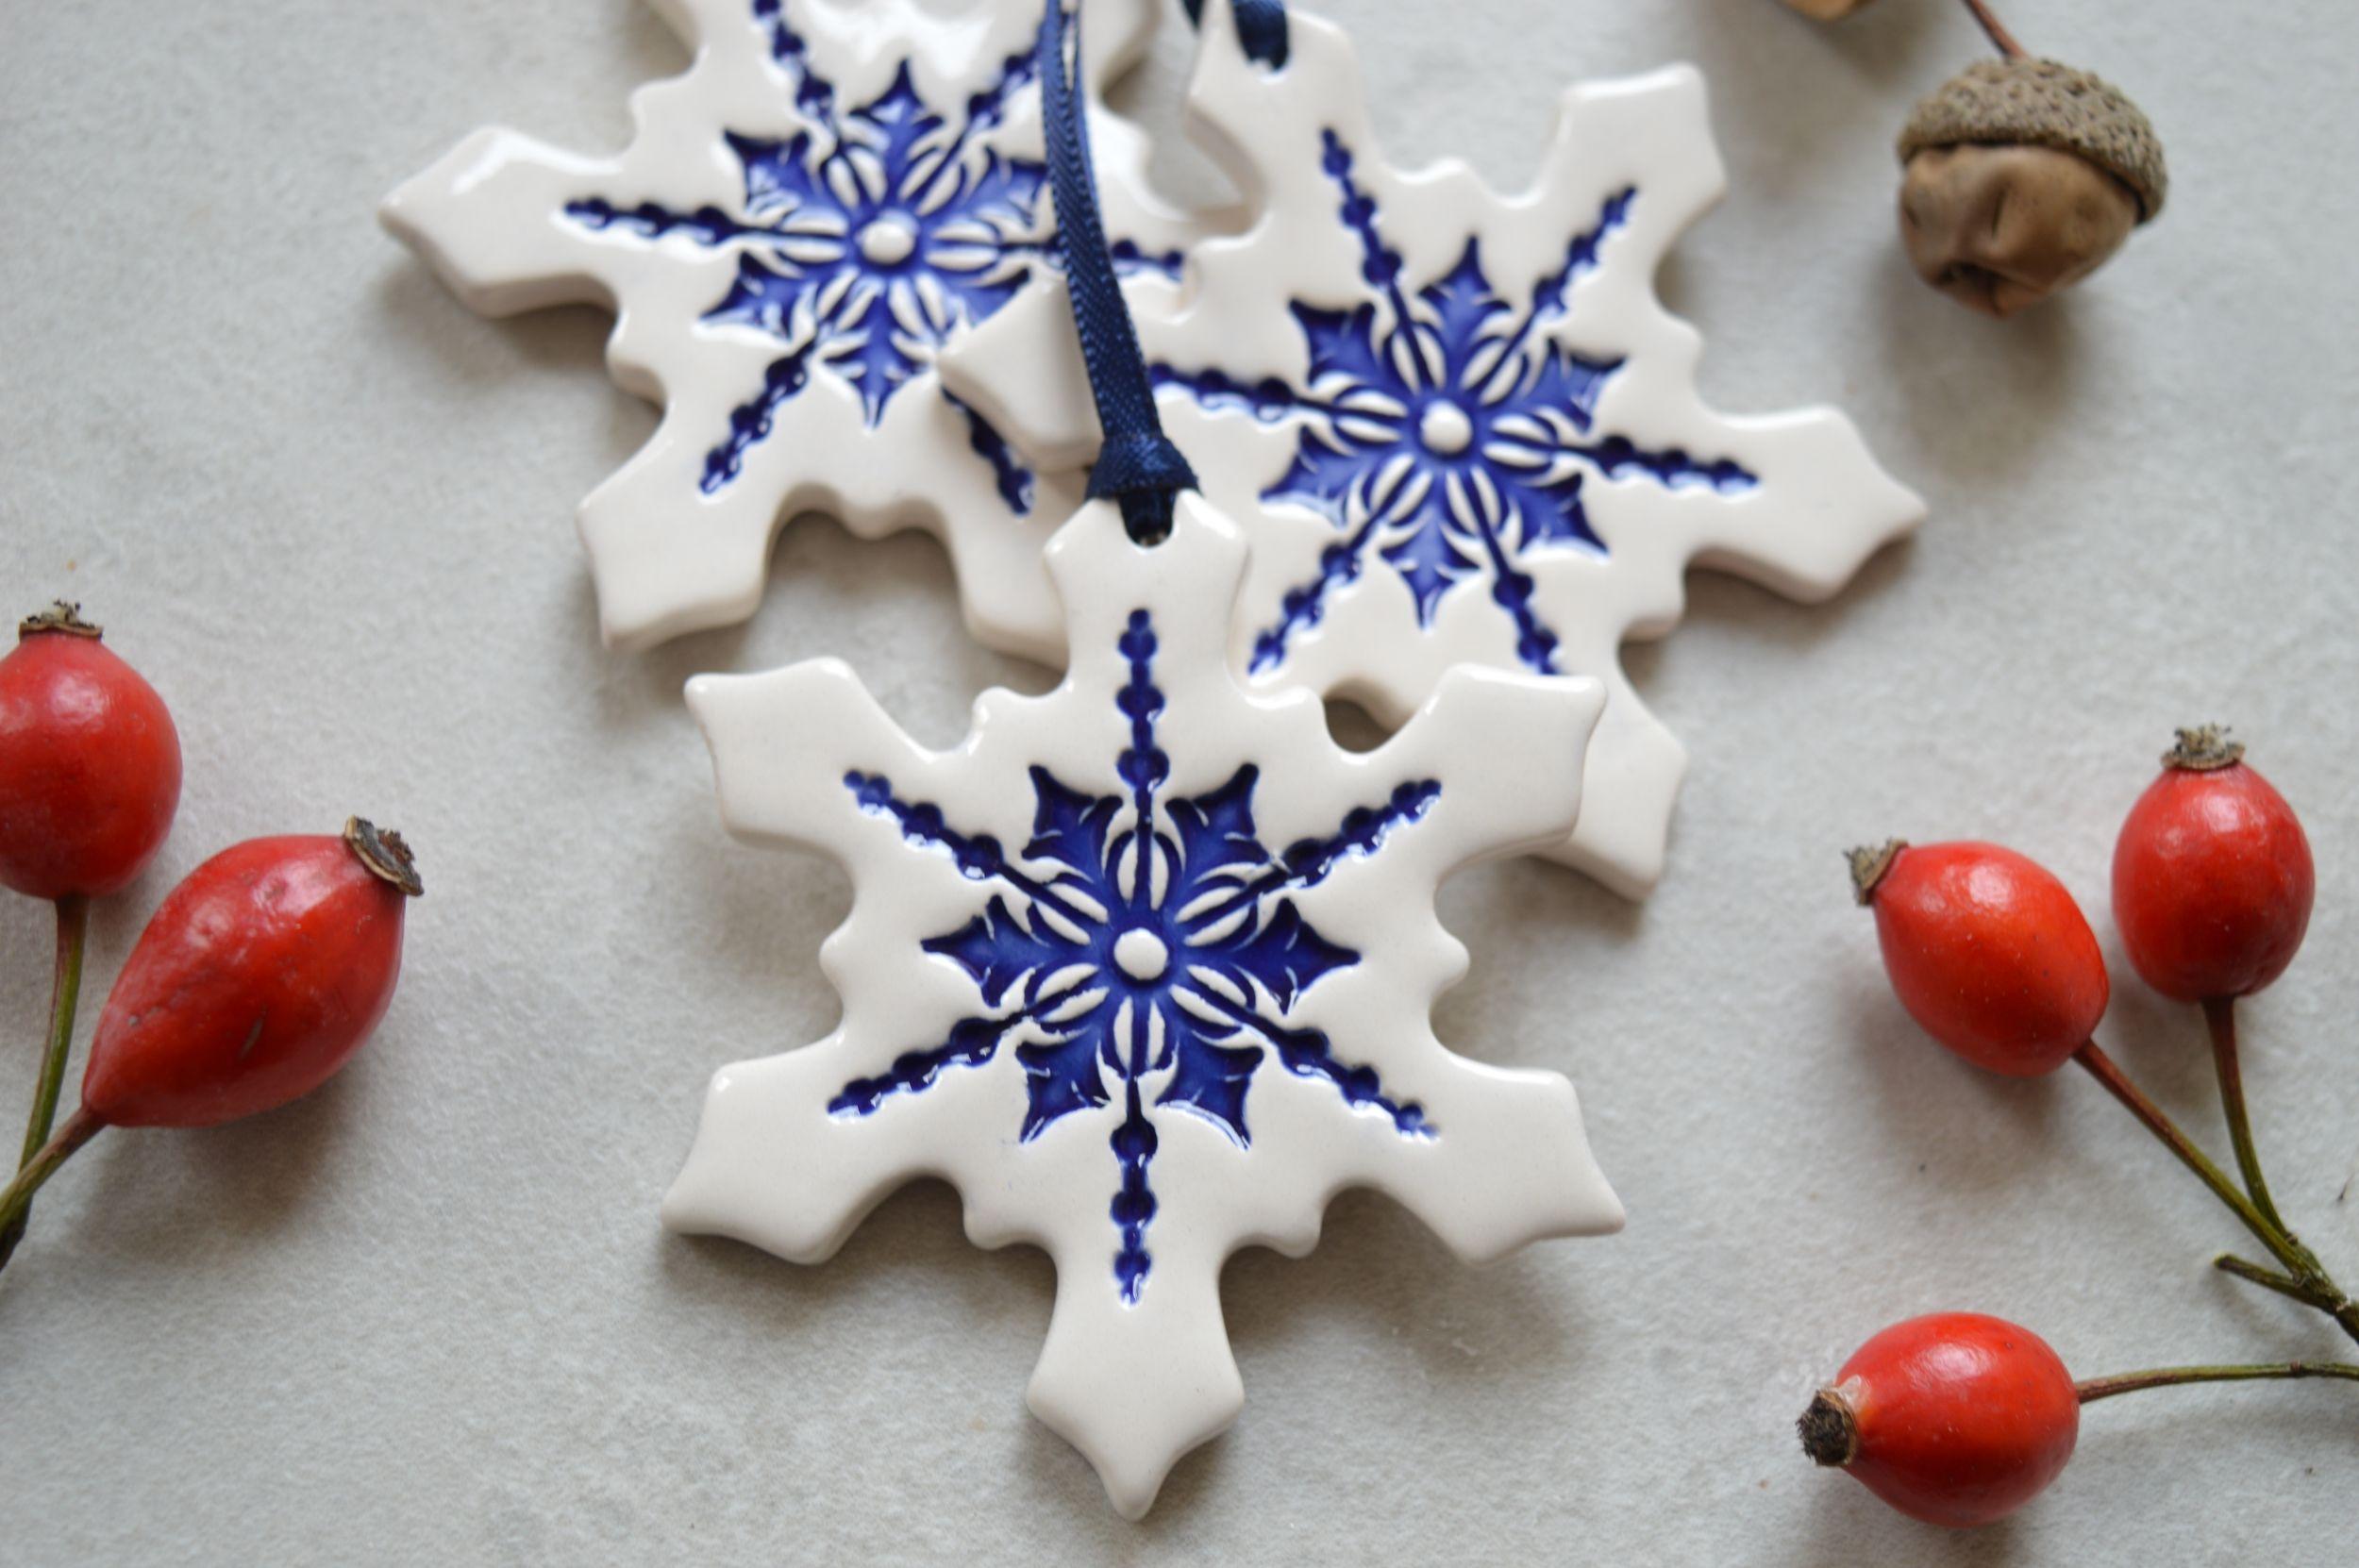 Christmas Decorations Ceramic Snowflake Ornament Set Of 3 White Christmas Ornaments Handmade Christmas Decorations Ceramic Christmas Decorations